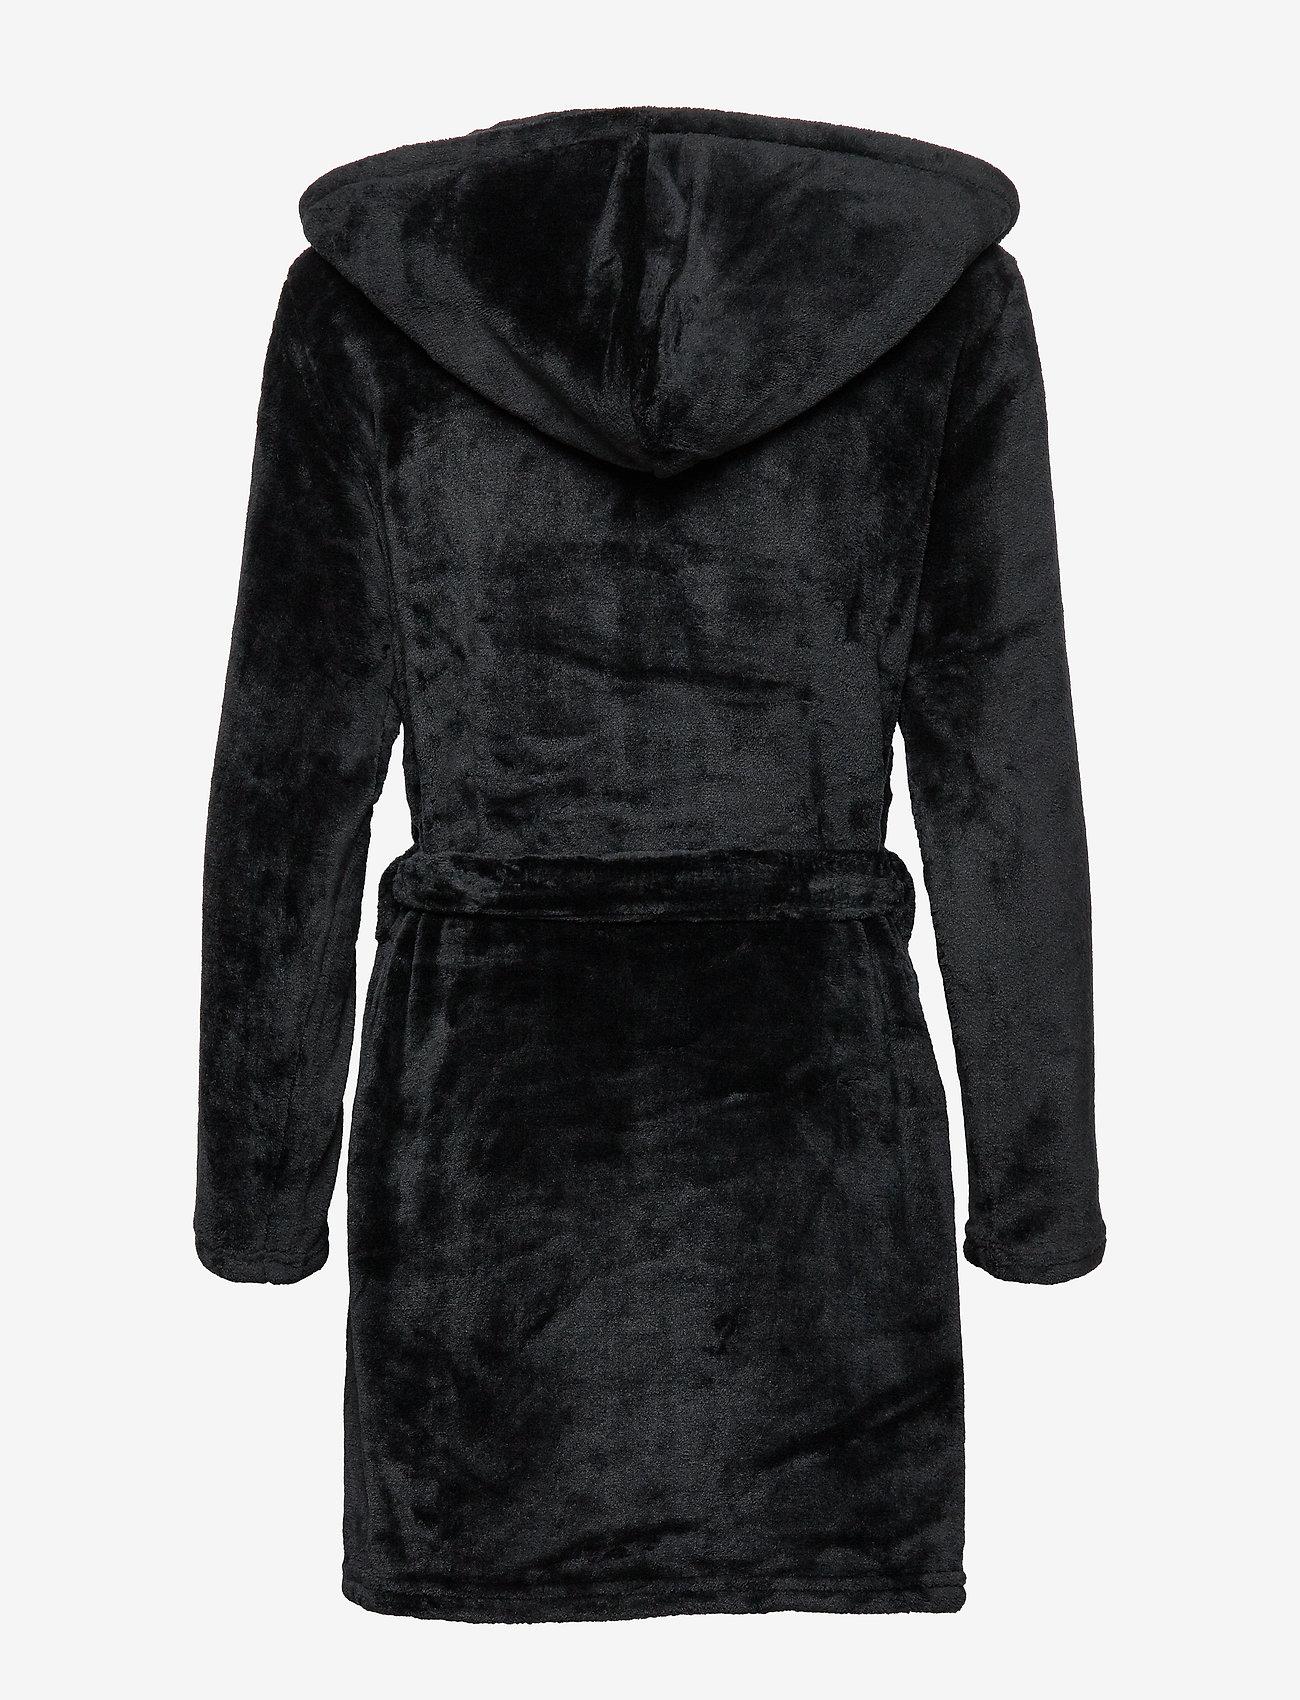 Decoy - DECOY short robe w/hood - bathrobes - black - 1